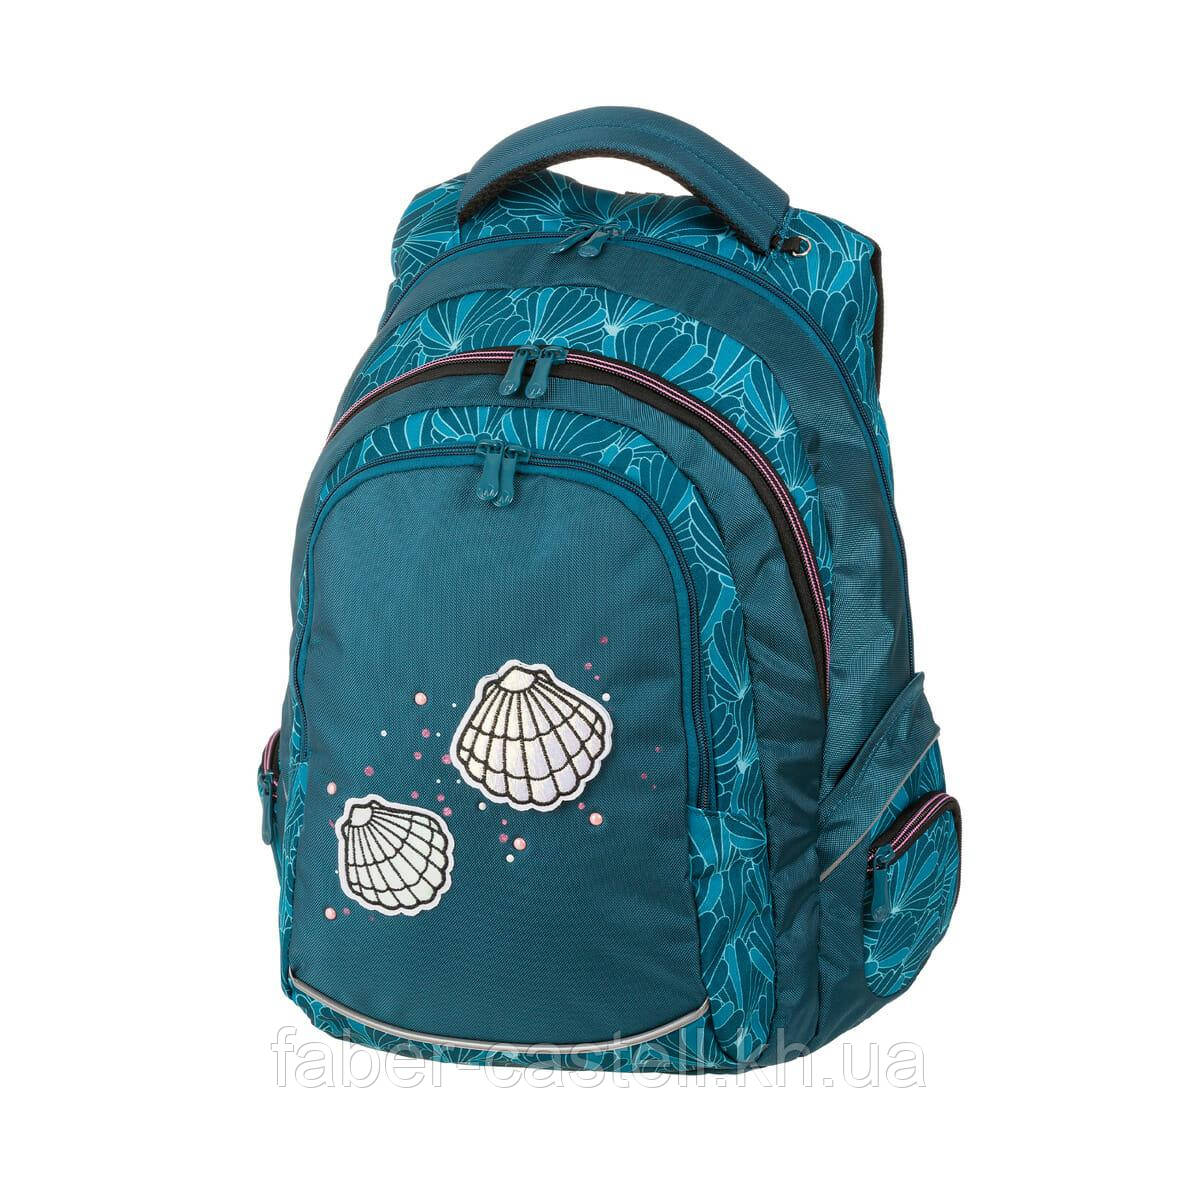 Рюкзак Schneiders Walker School Backpack Pearl, для девочки цвет бирюзовый, 42037-064